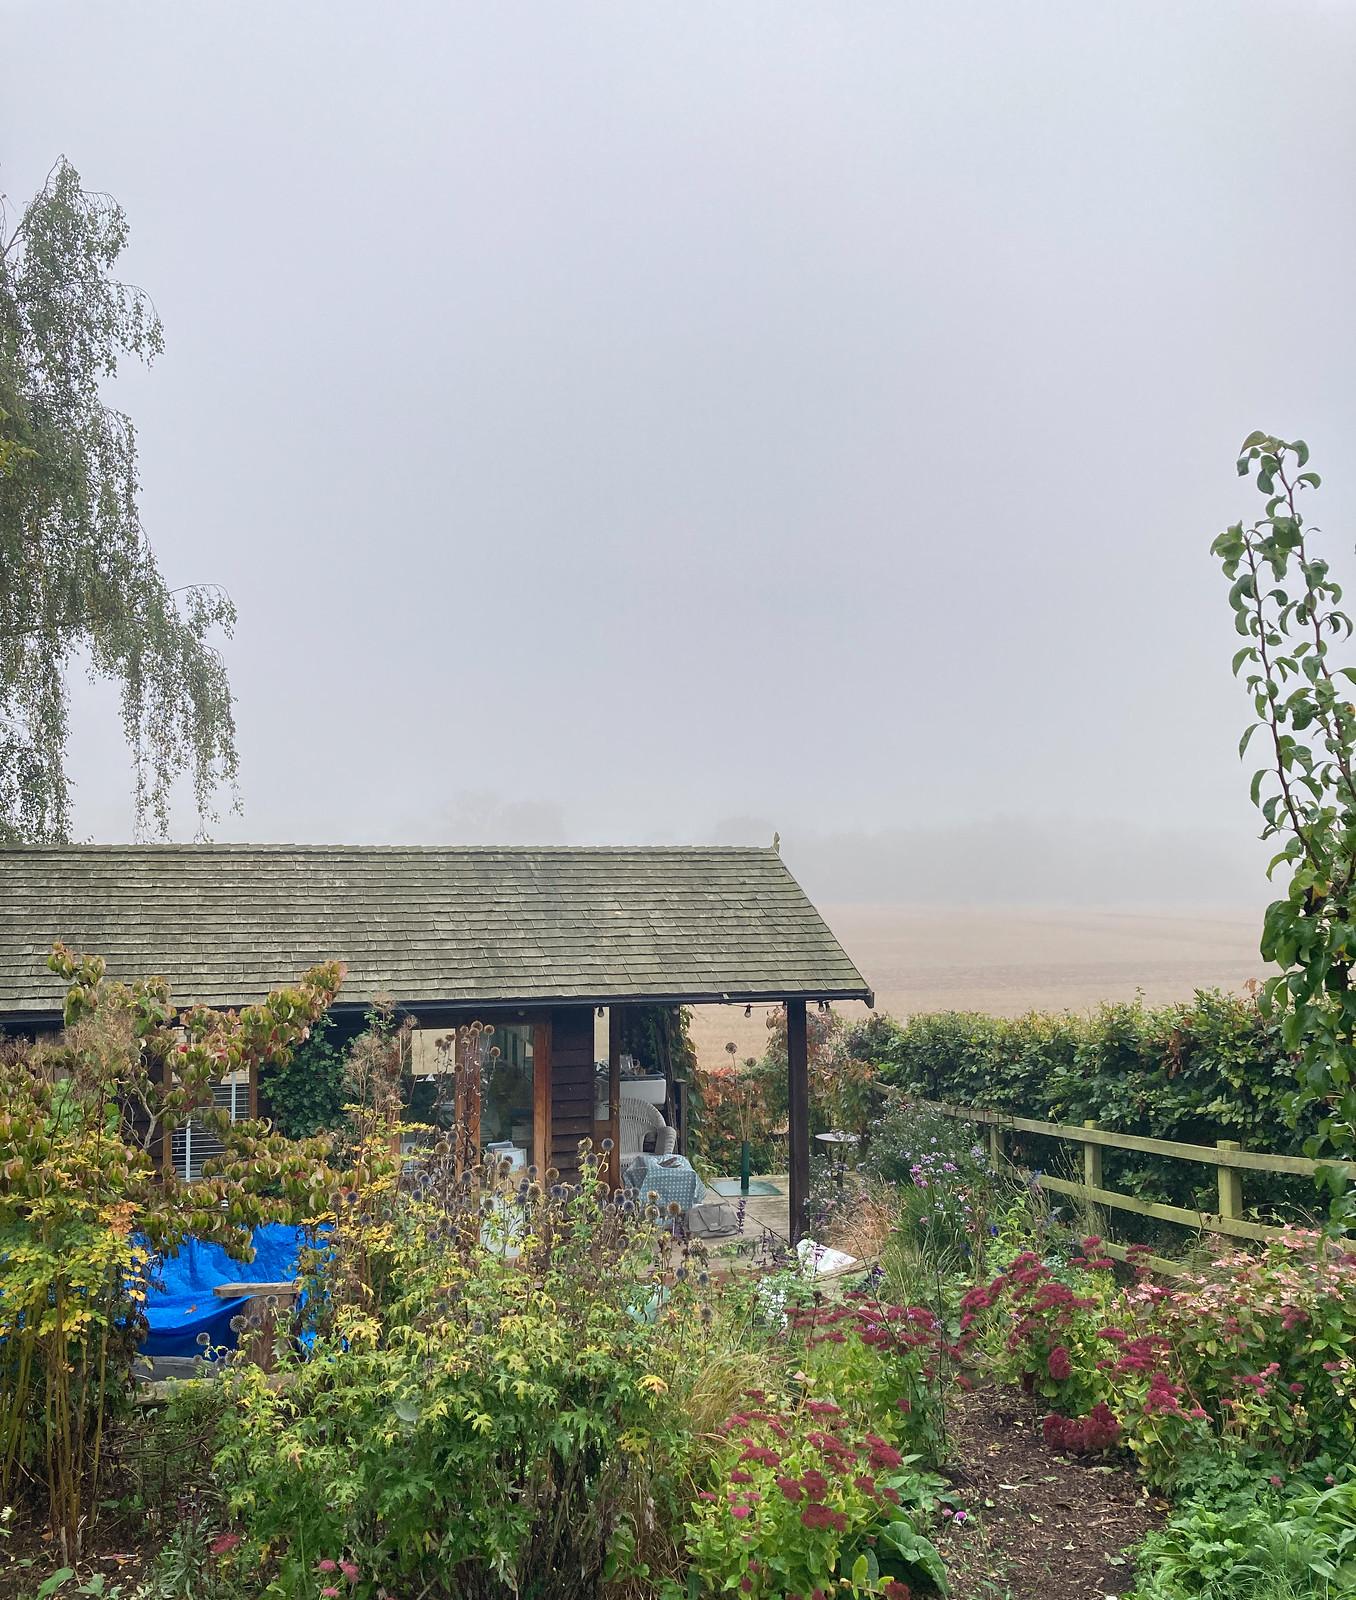 A bit foggy